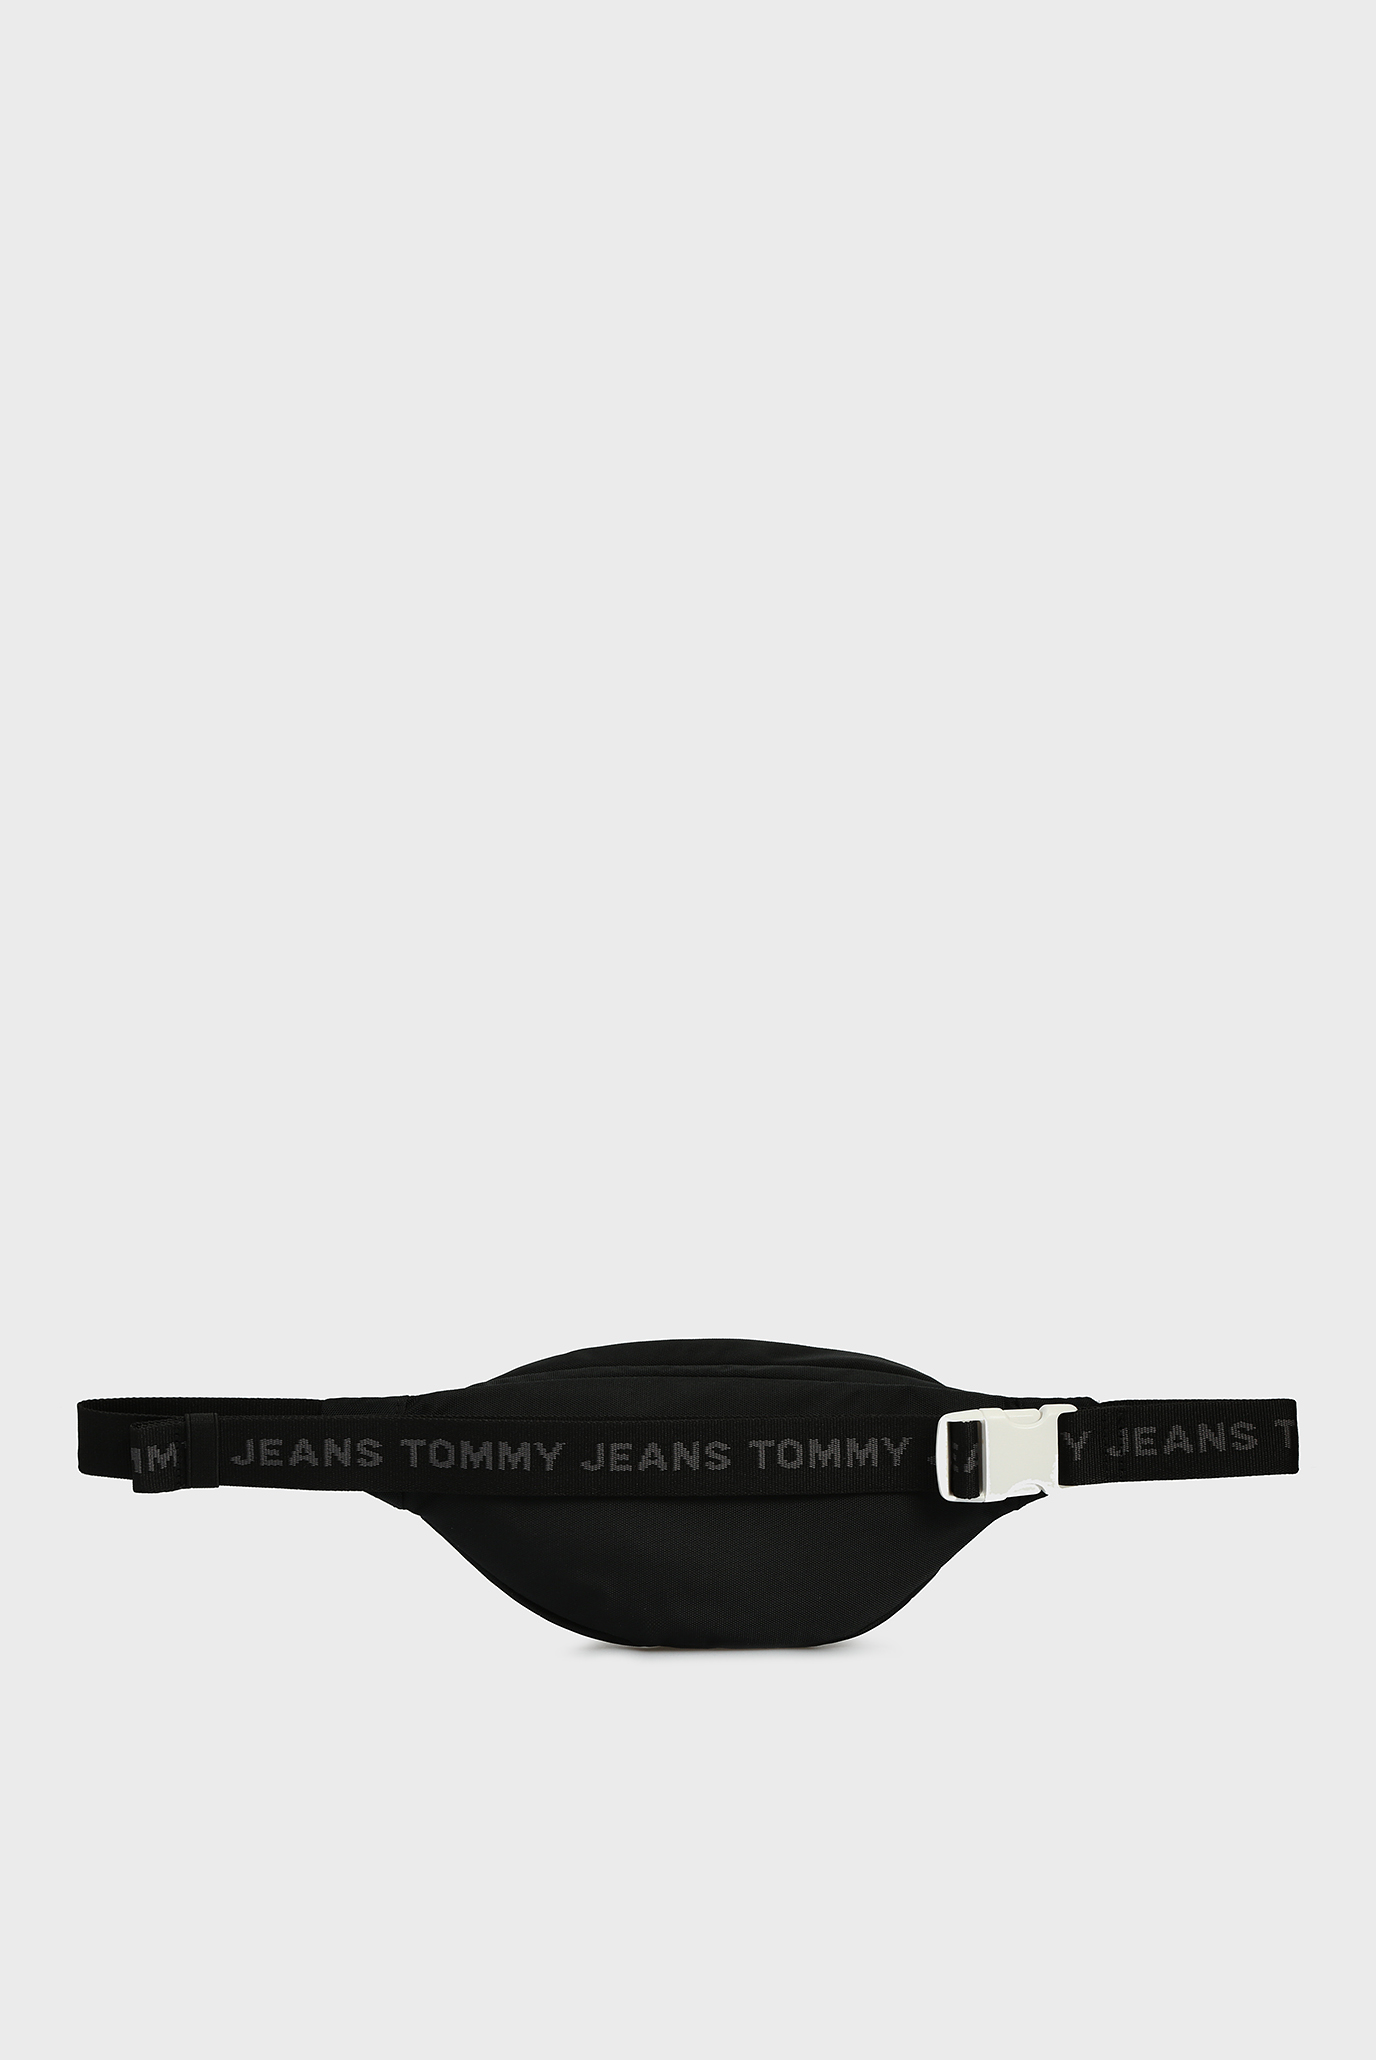 Мужская черная поясная сумка TJM COOL CITY Tommy Hilfiger